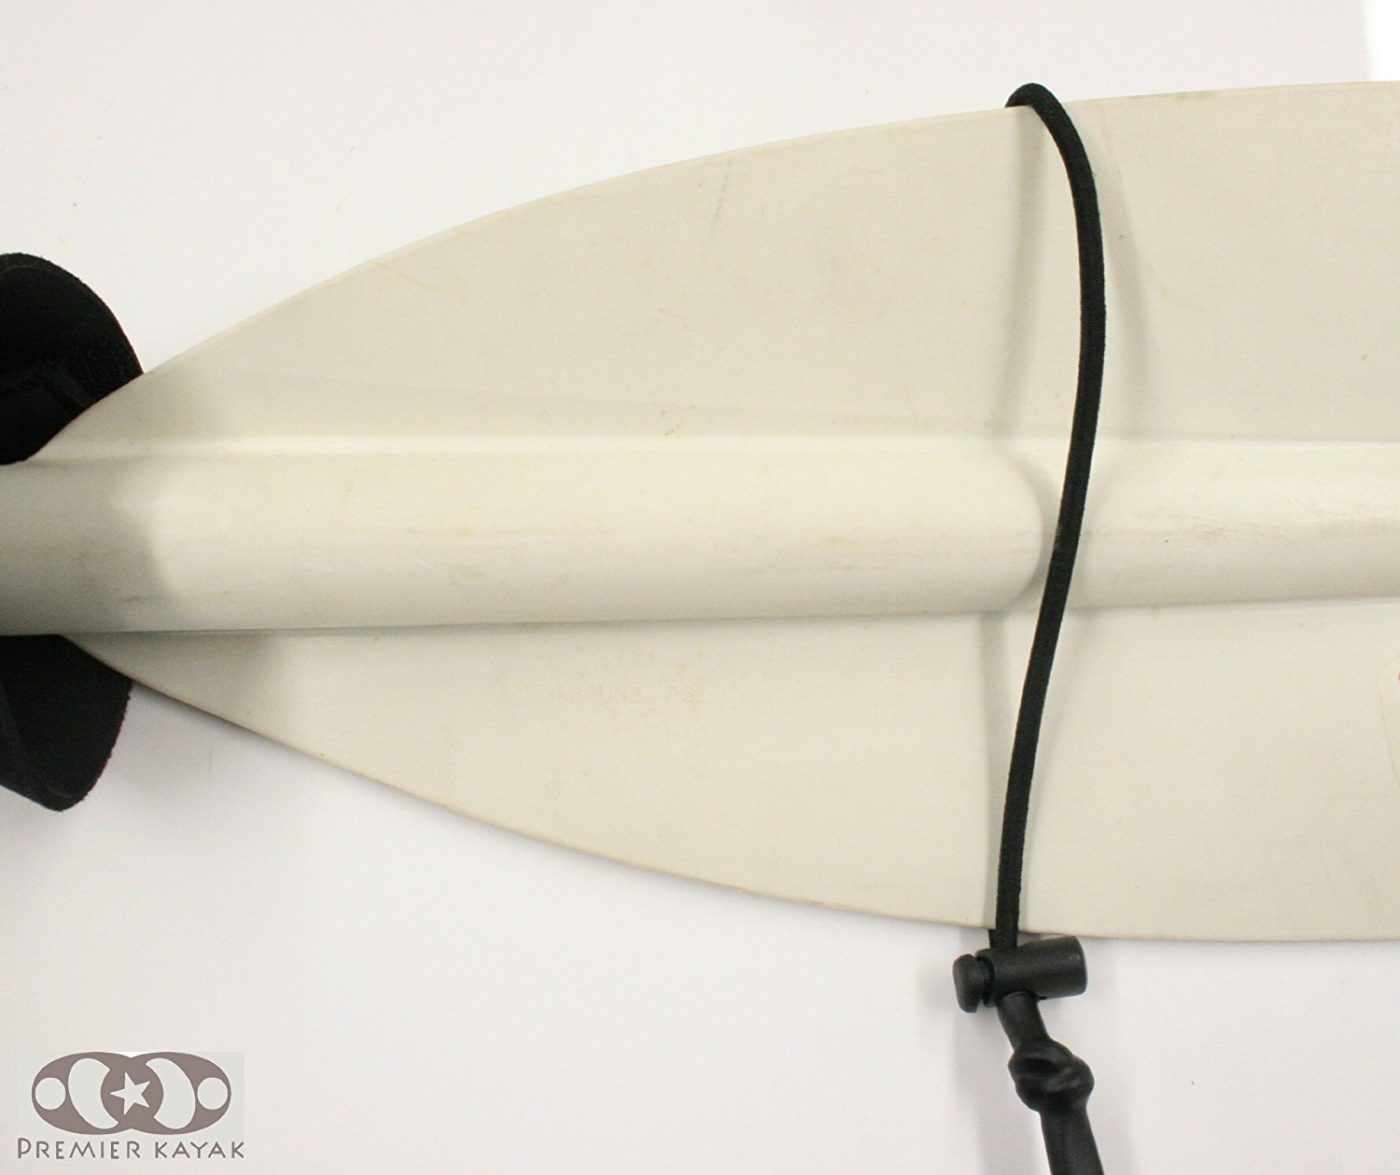 Premier Kayak Paddle Leash